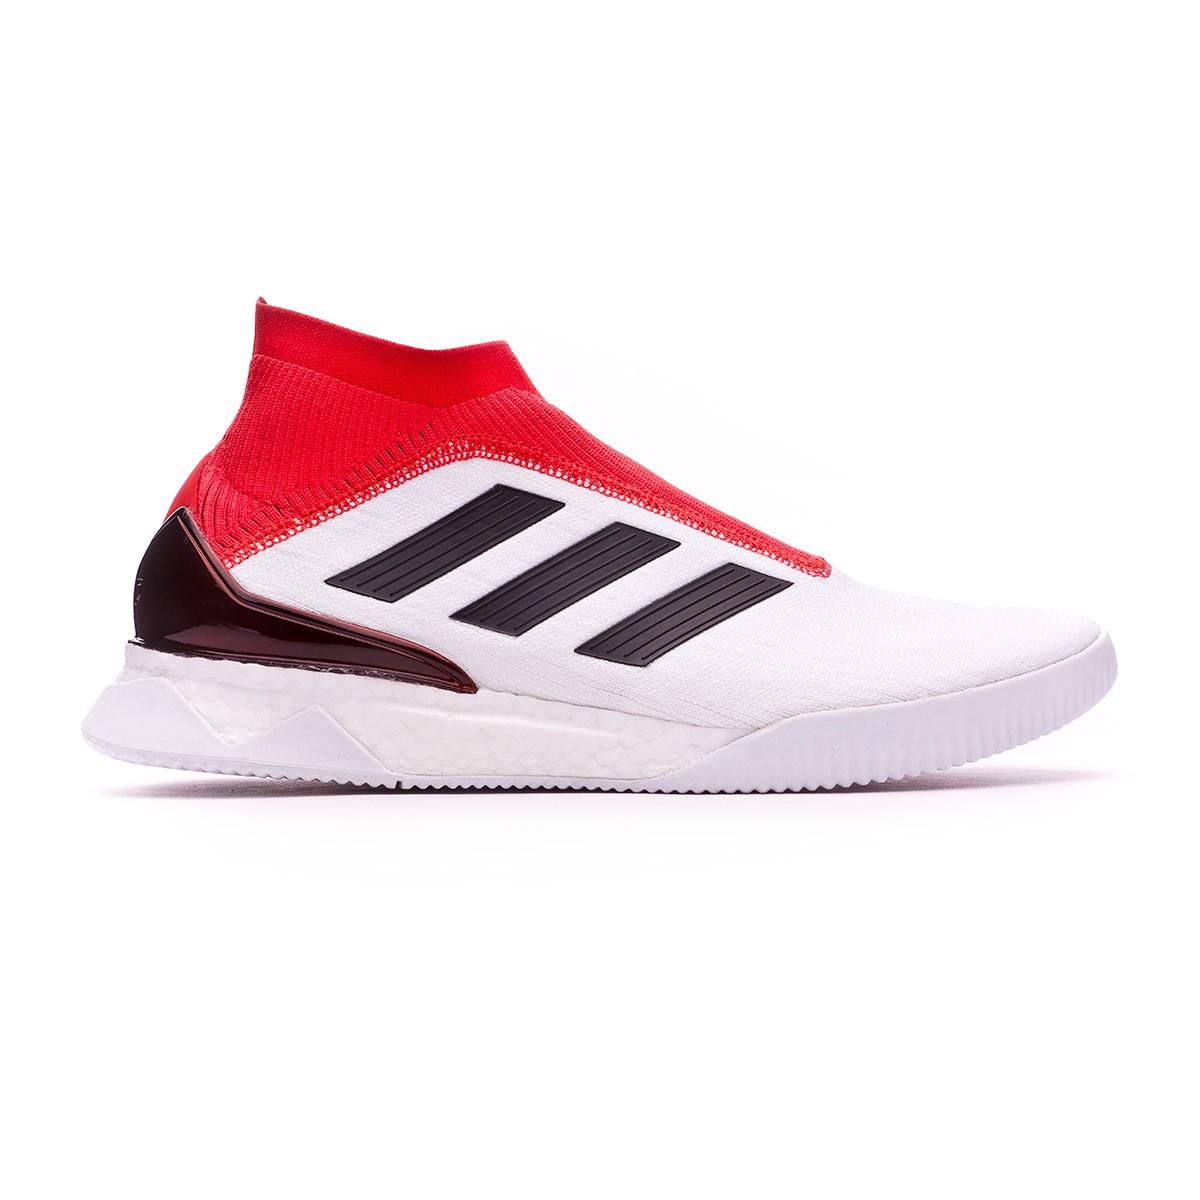 4132a9bc05634 Trainers adidas Predator Tango 18+ TR UltraBoost White-Core black-Real  coral - Tienda de fútbol Fútbol Emotion